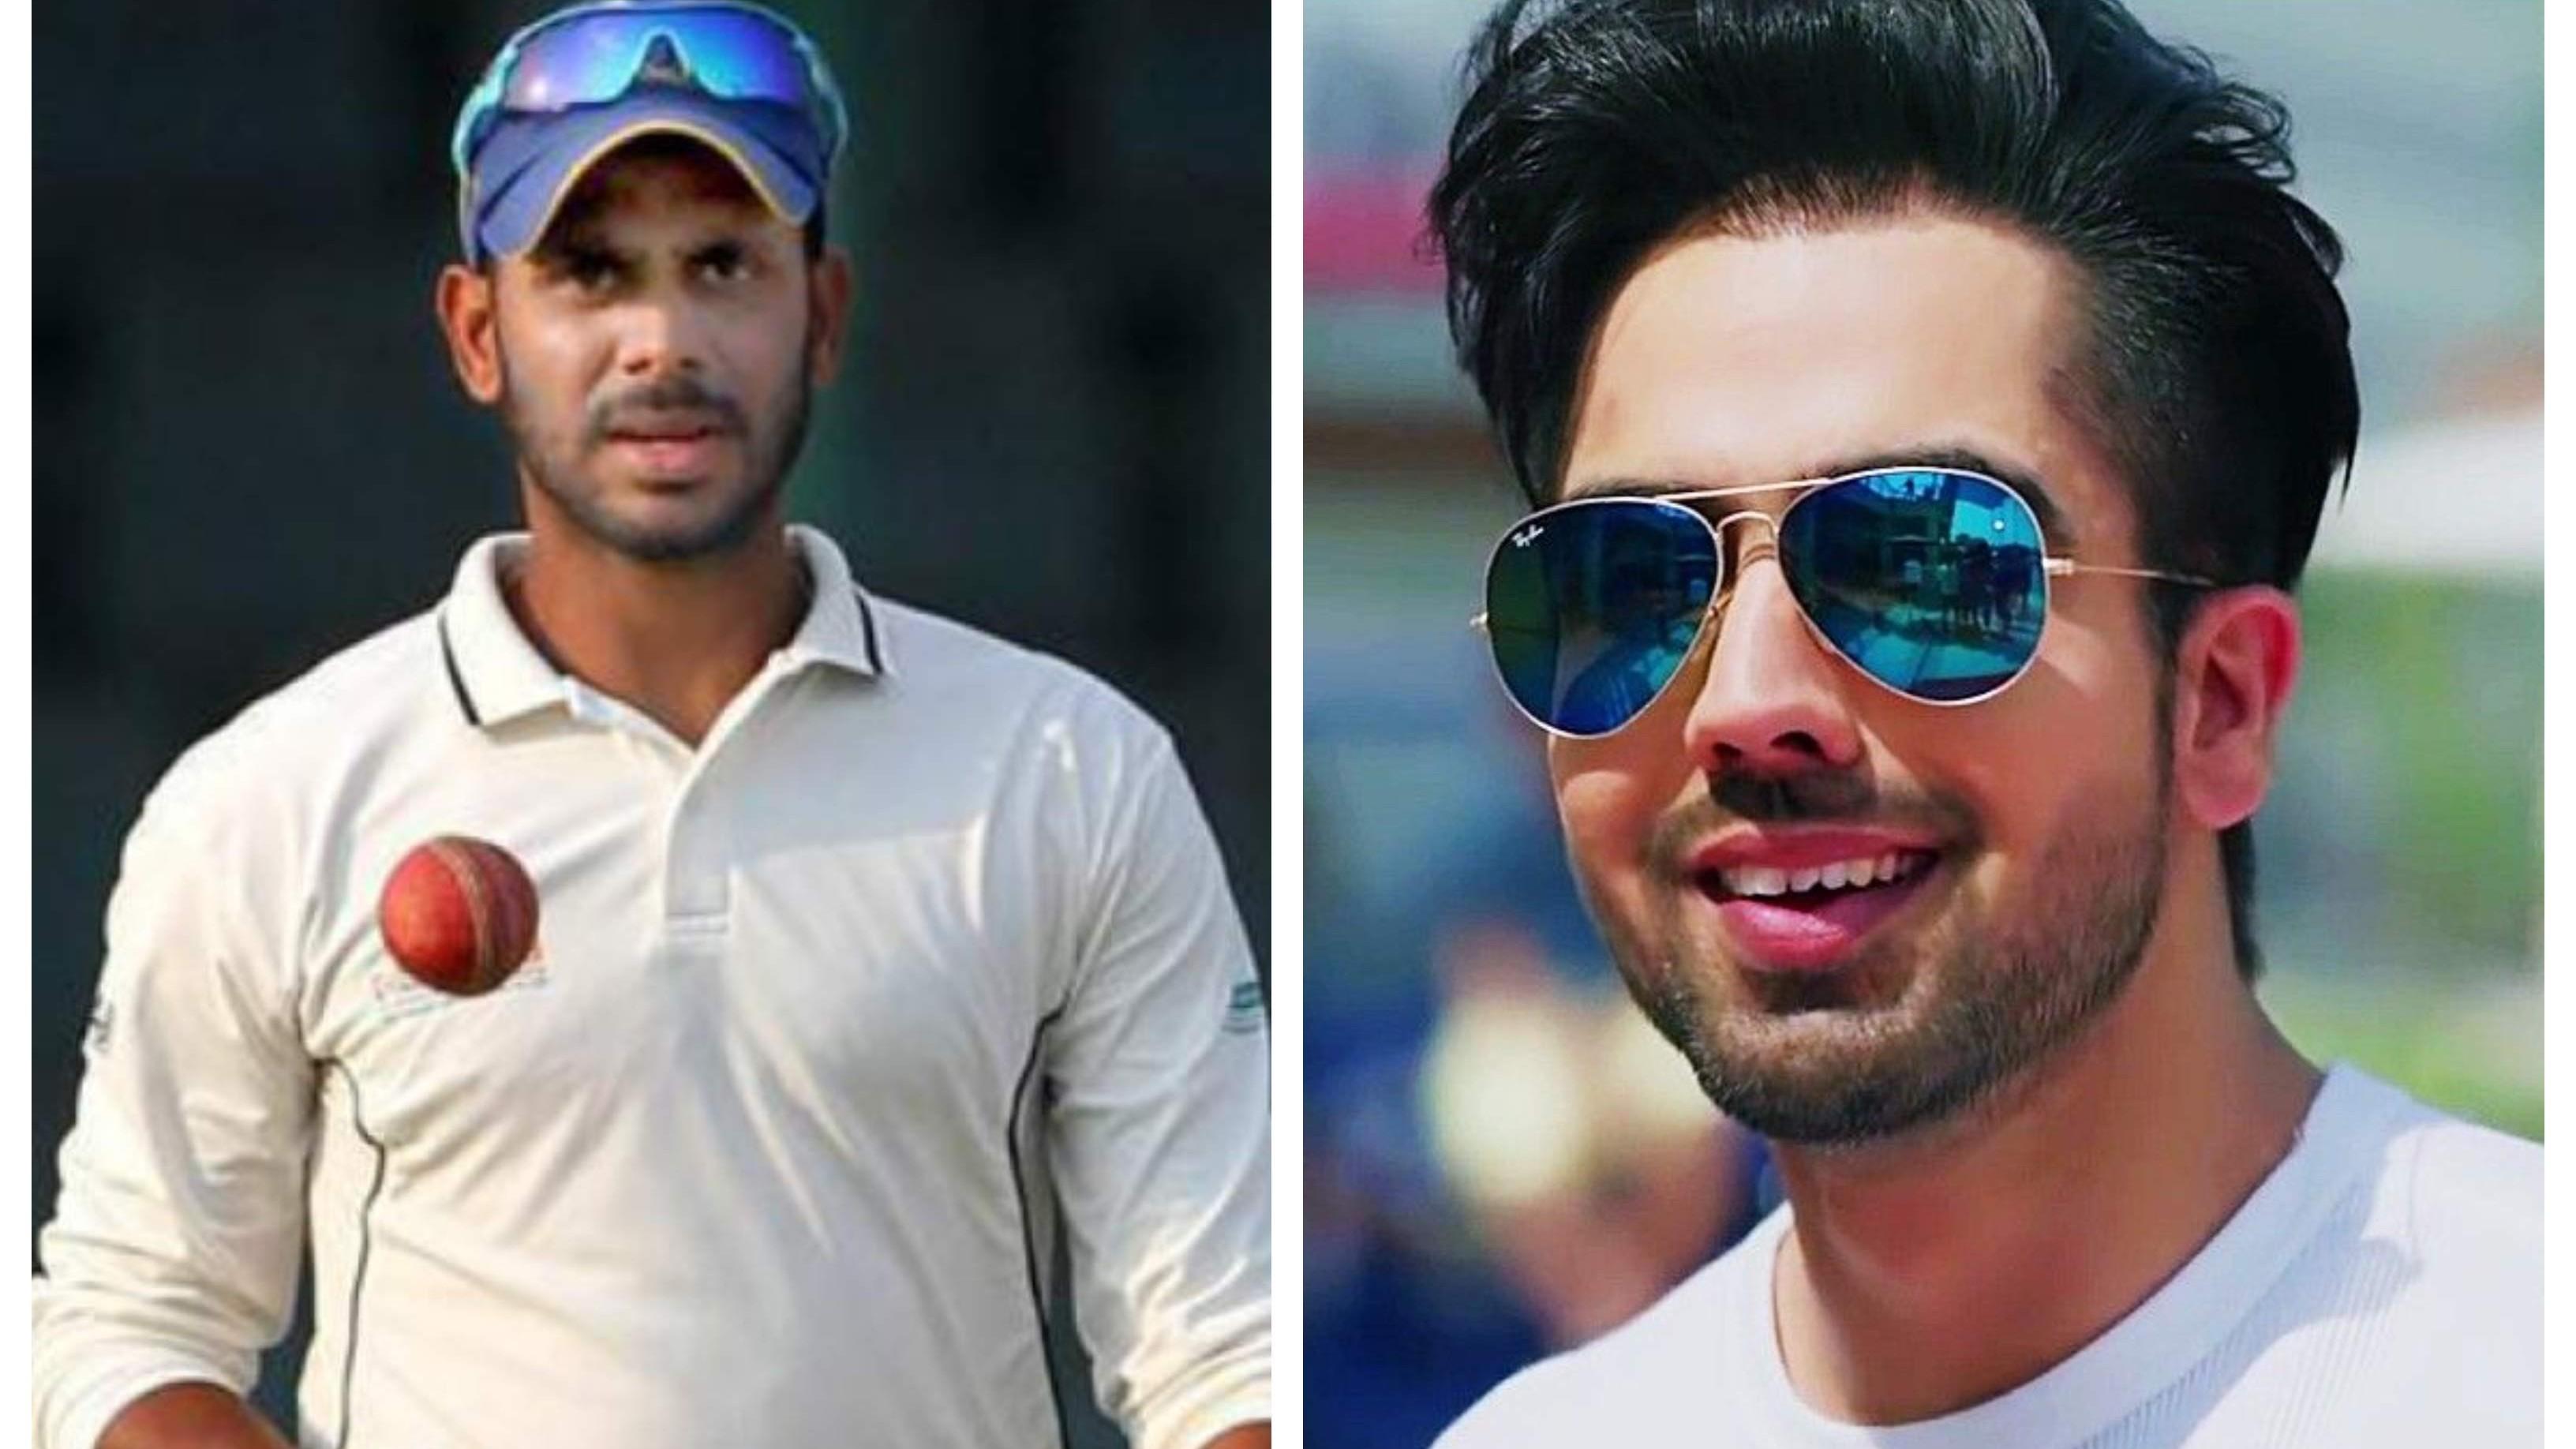 Manoj Tiwary recalls playing alongside Punjabi singer Harrdy Sandhu for India U-19 team